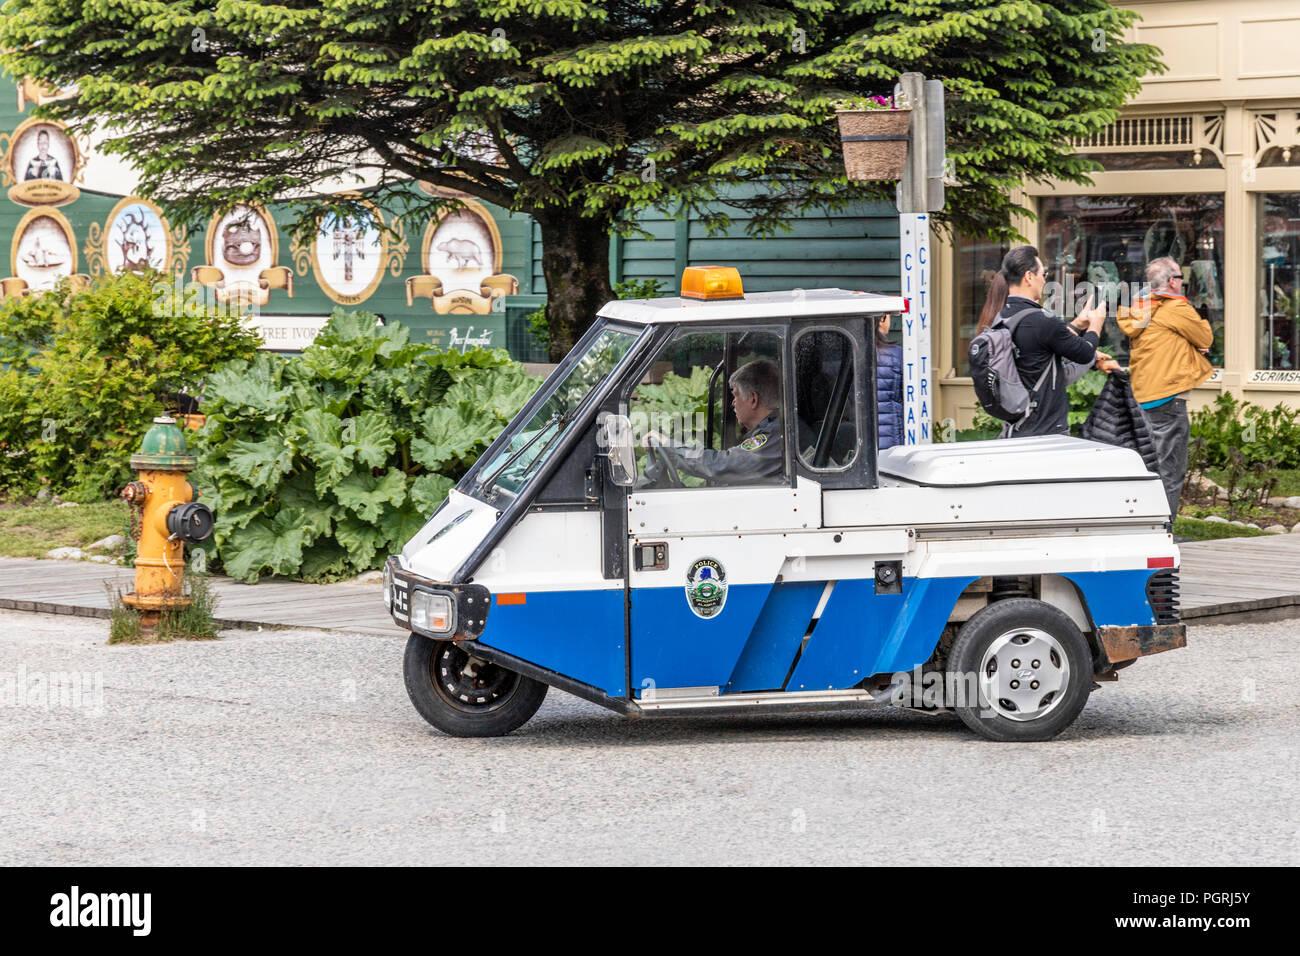 Unusual three wheeled police vehicle (ex NYPD?)  in Skagway, Alaska USA - Stock Image